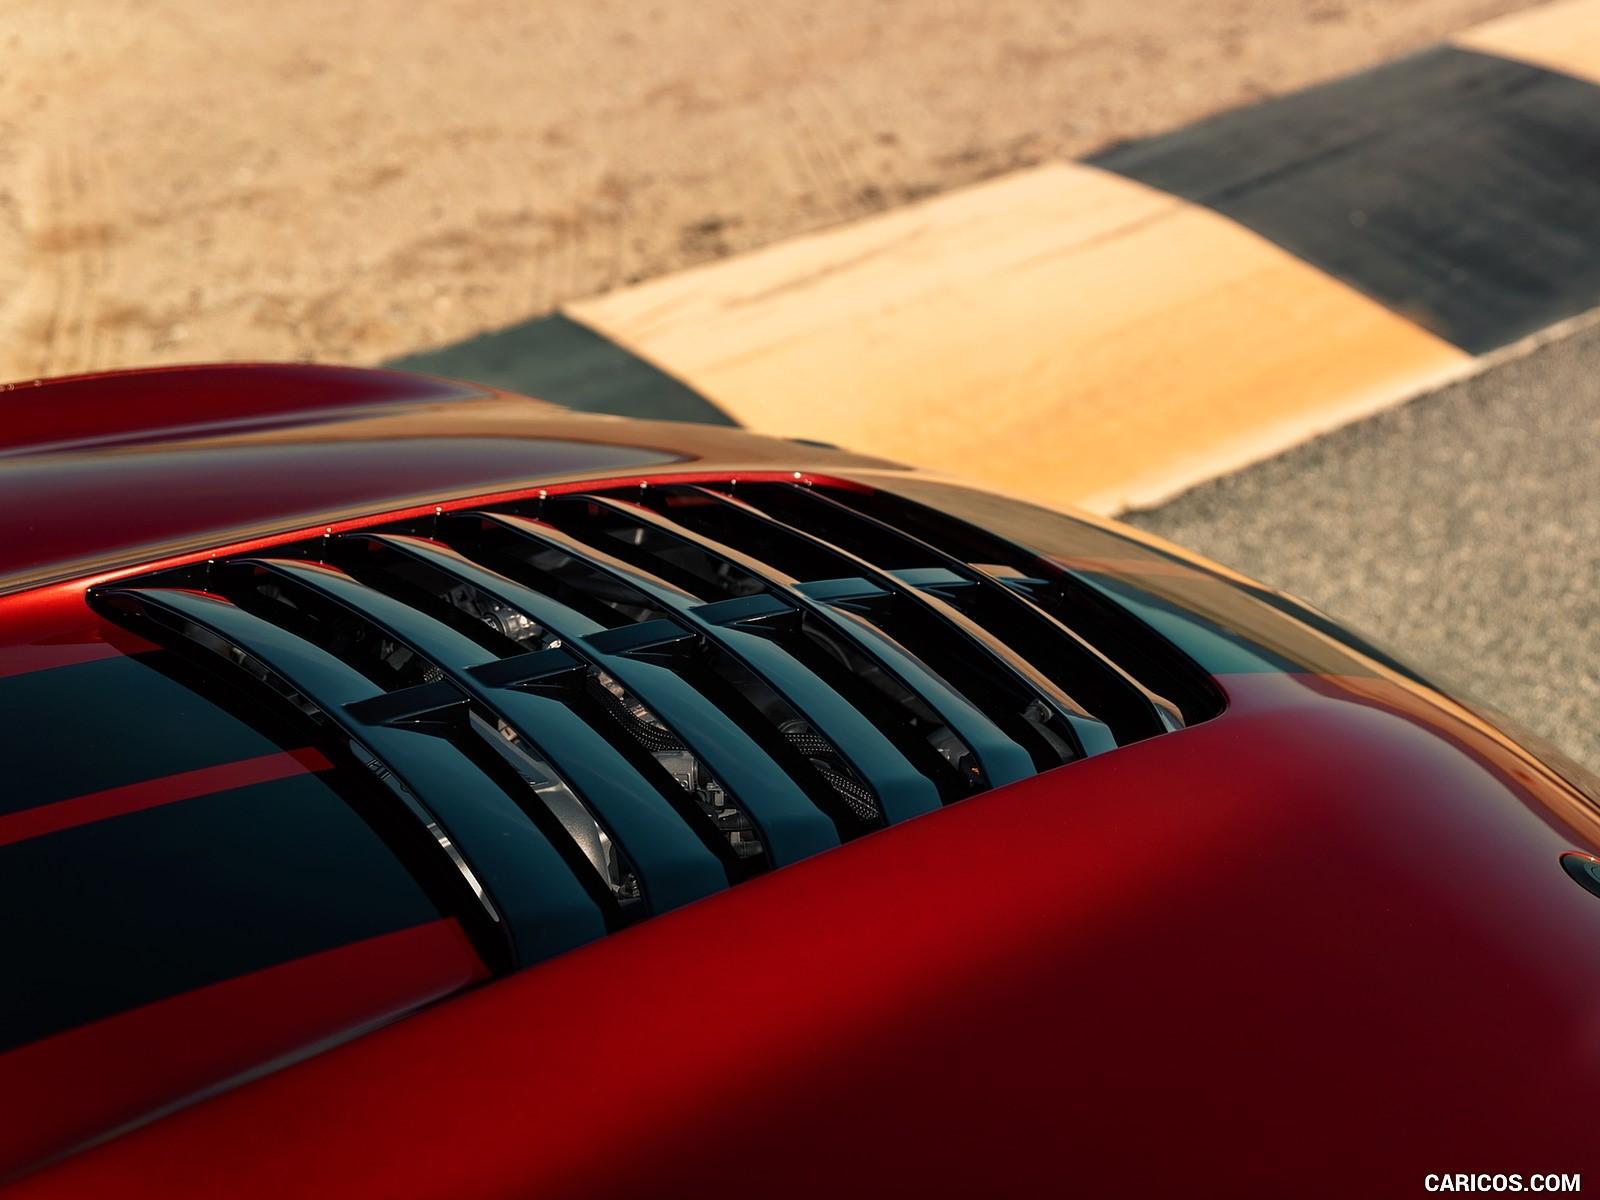 Ford Mustang Shelby 8k duvarkağıtları